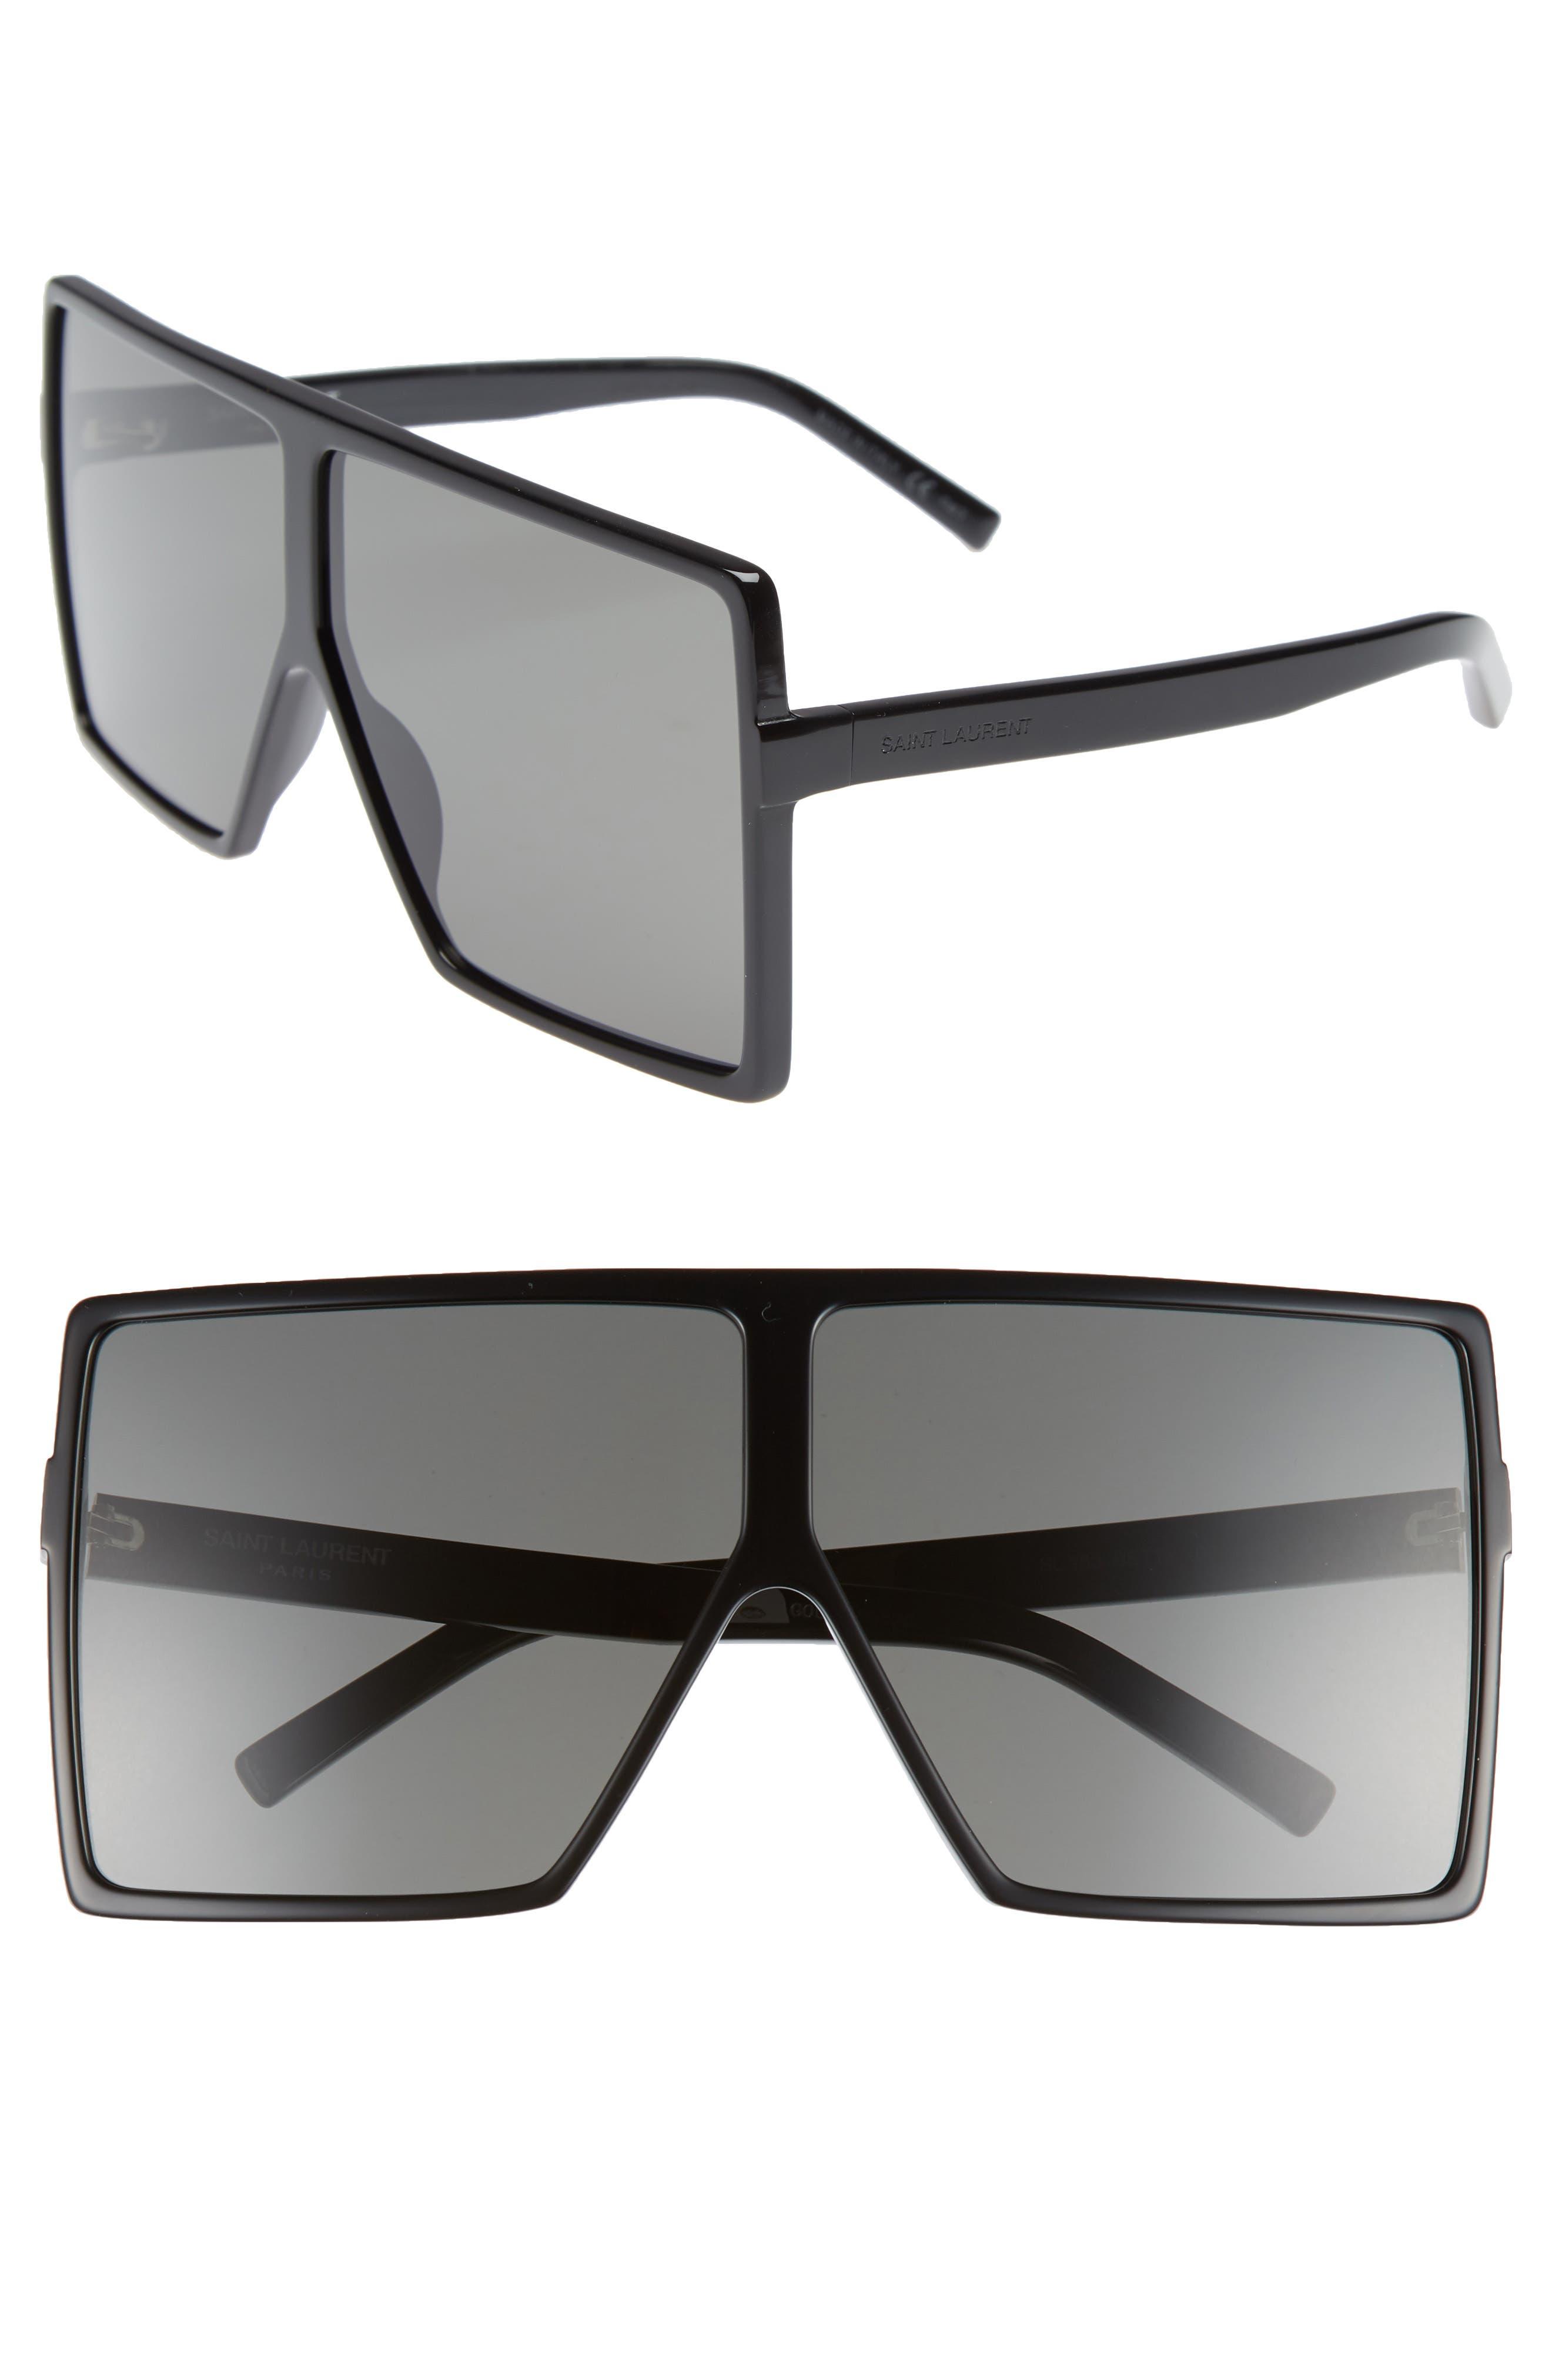 68mm Oversize Square Sunglasses,                         Main,                         color, 004